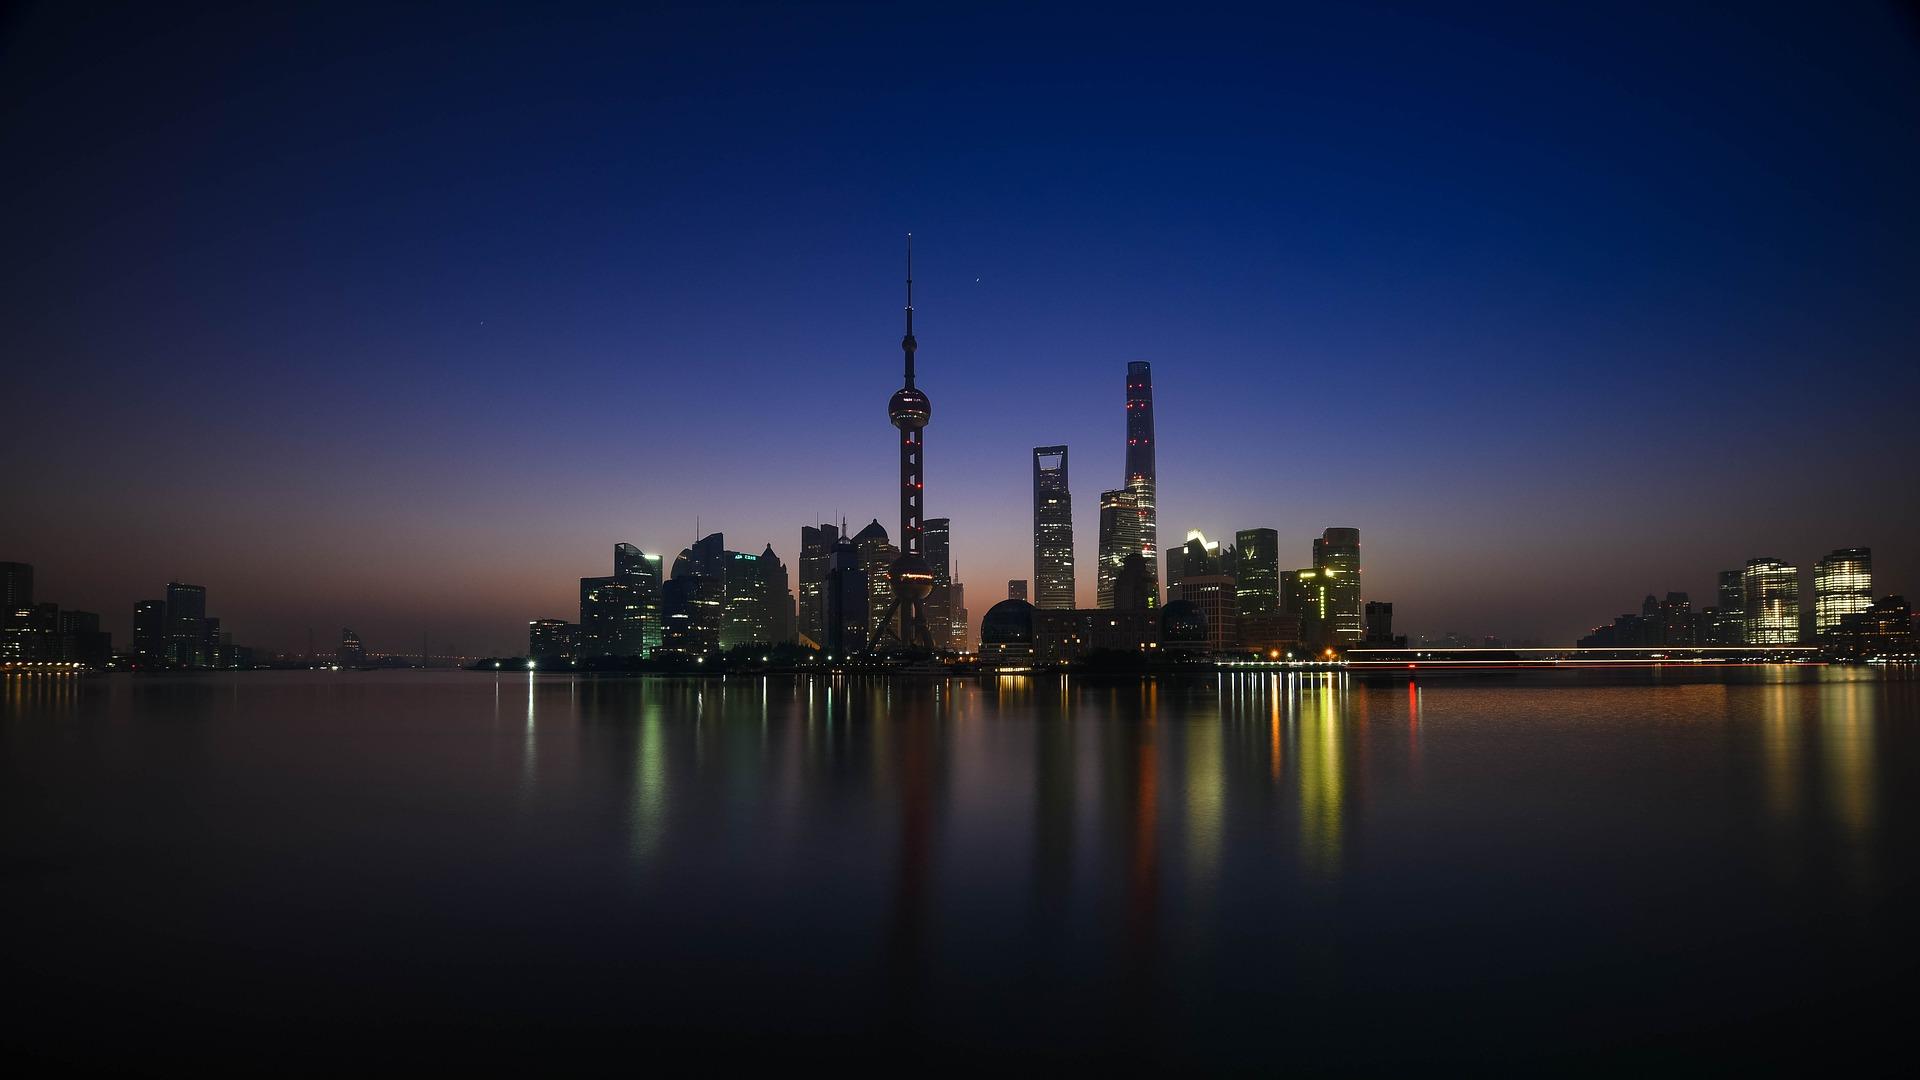 Shanghai airport to city center, Shanghai airport to city, How To Get From Shanghai Airport To City Center